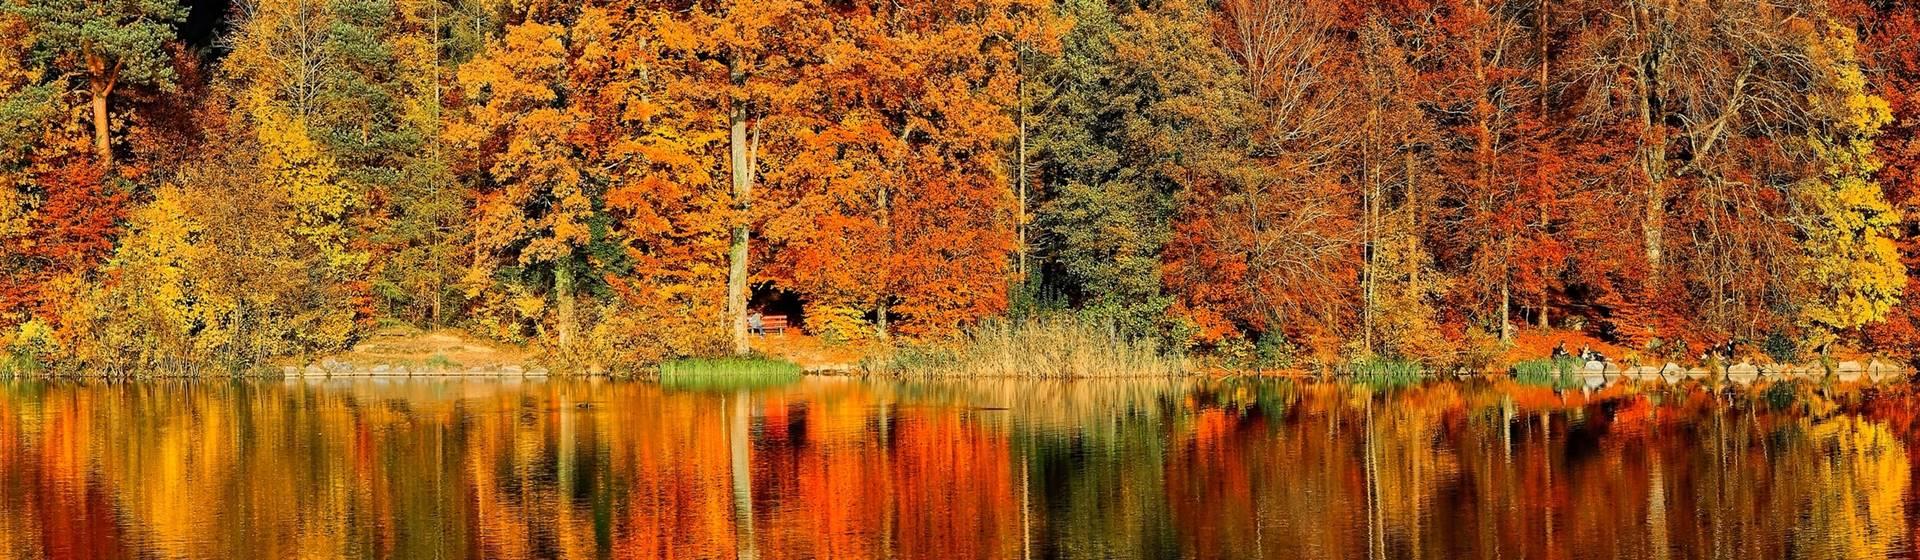 October and November